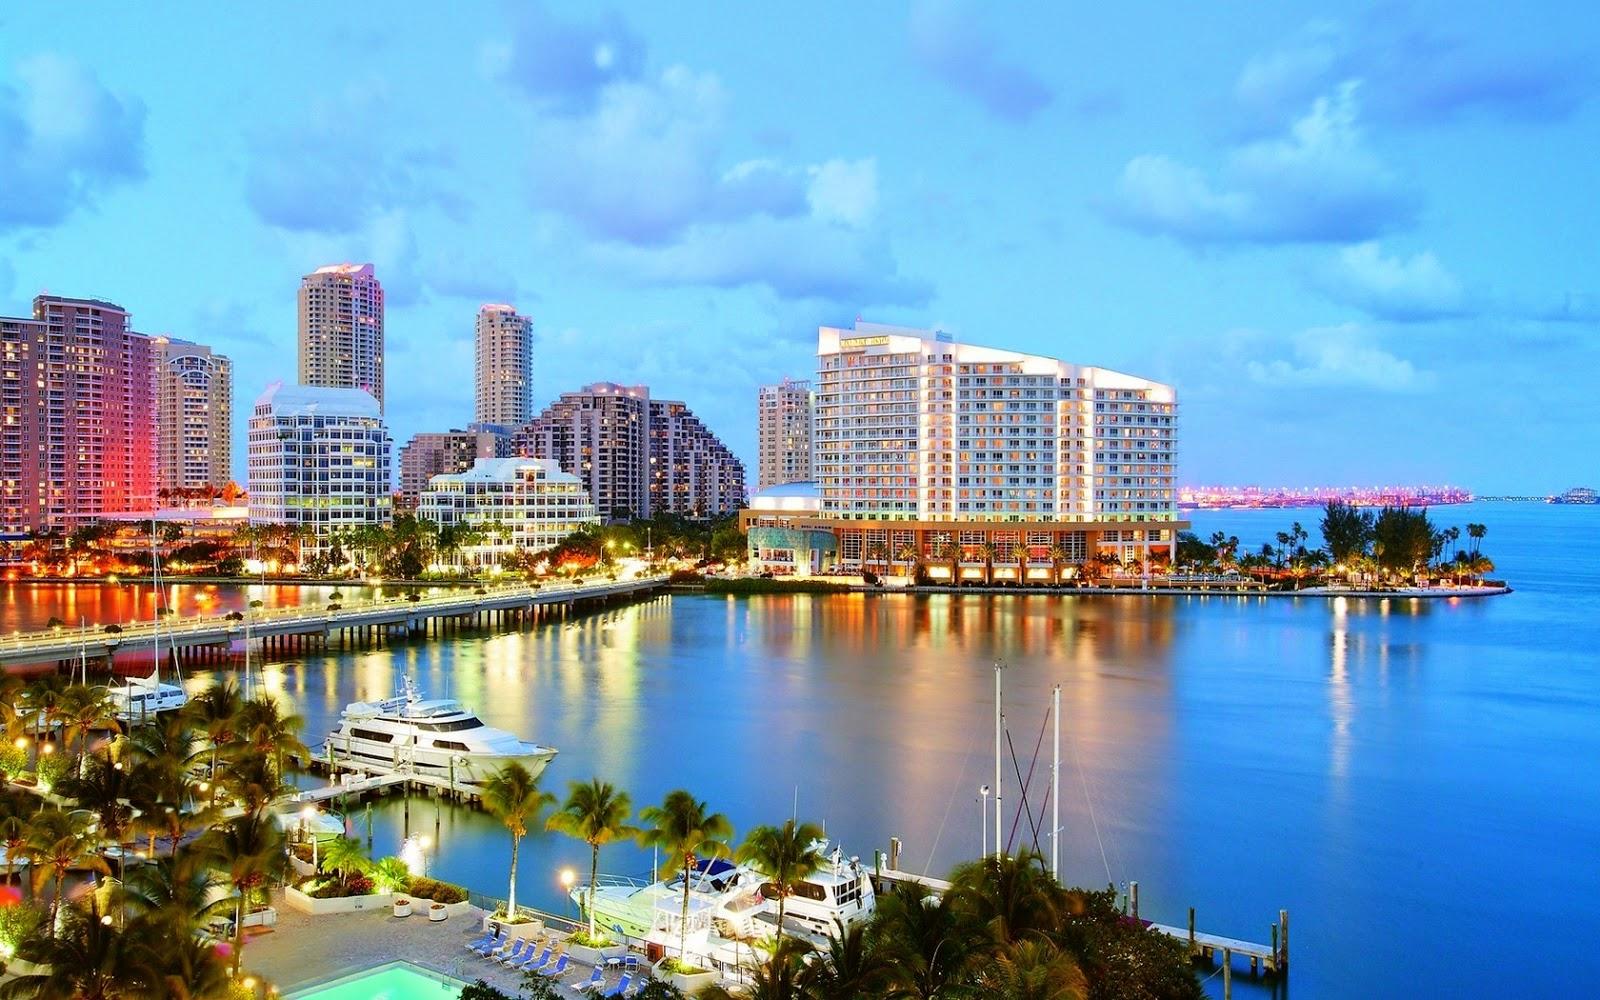 Papeis De Parede Para Windows 7: Papéis De Parede De Miami Beach